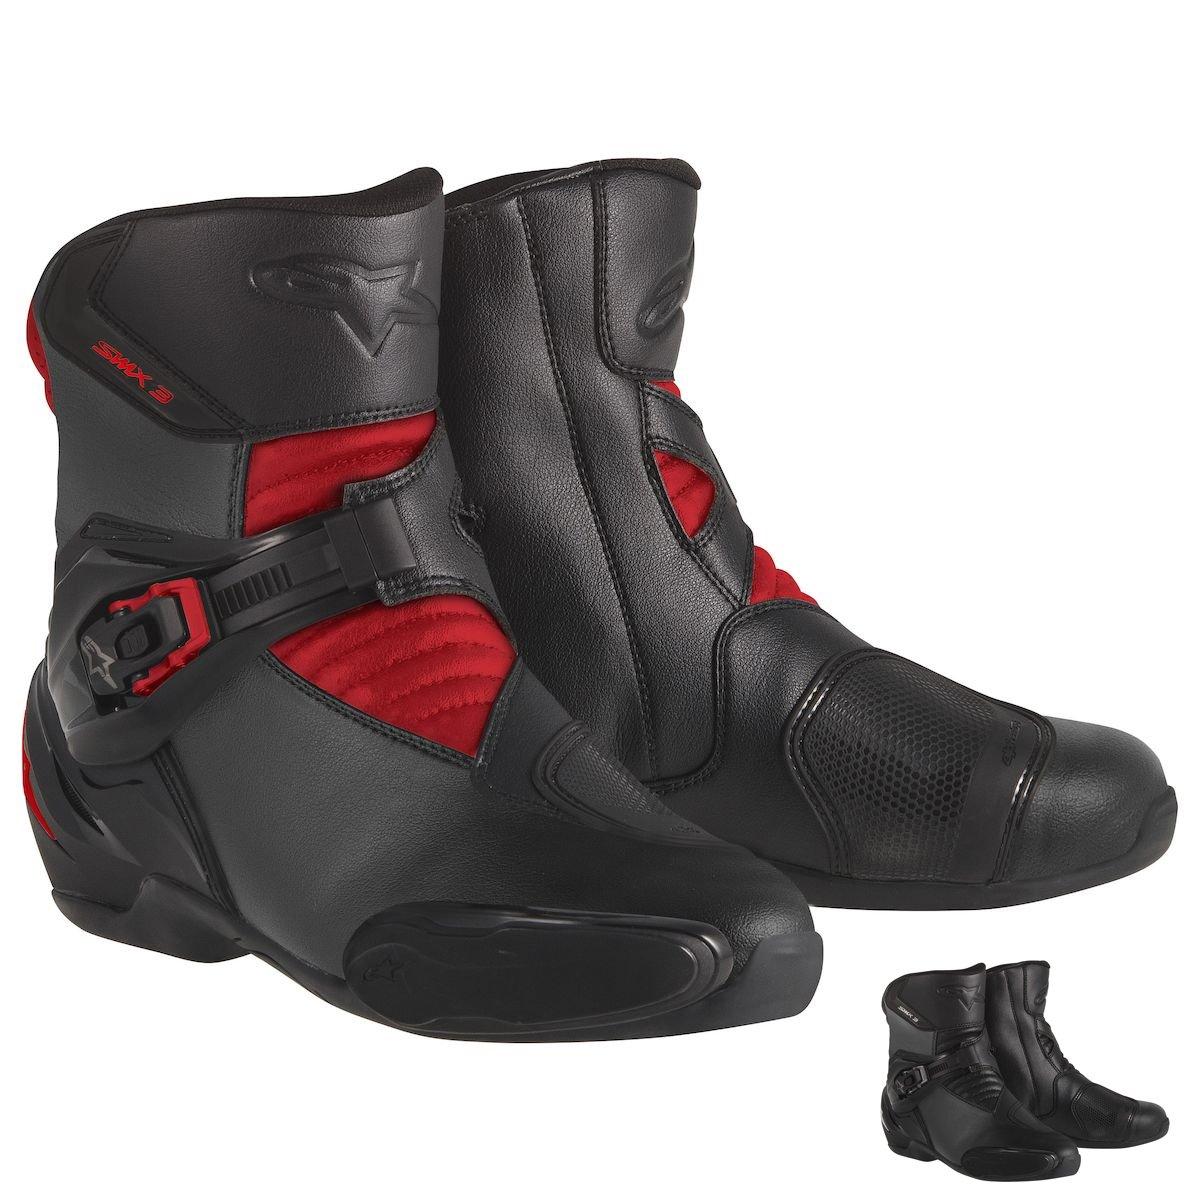 Alpinestars SMX-3 Men's Motorcycle Street Boots (Black/Red, EU Size 38)